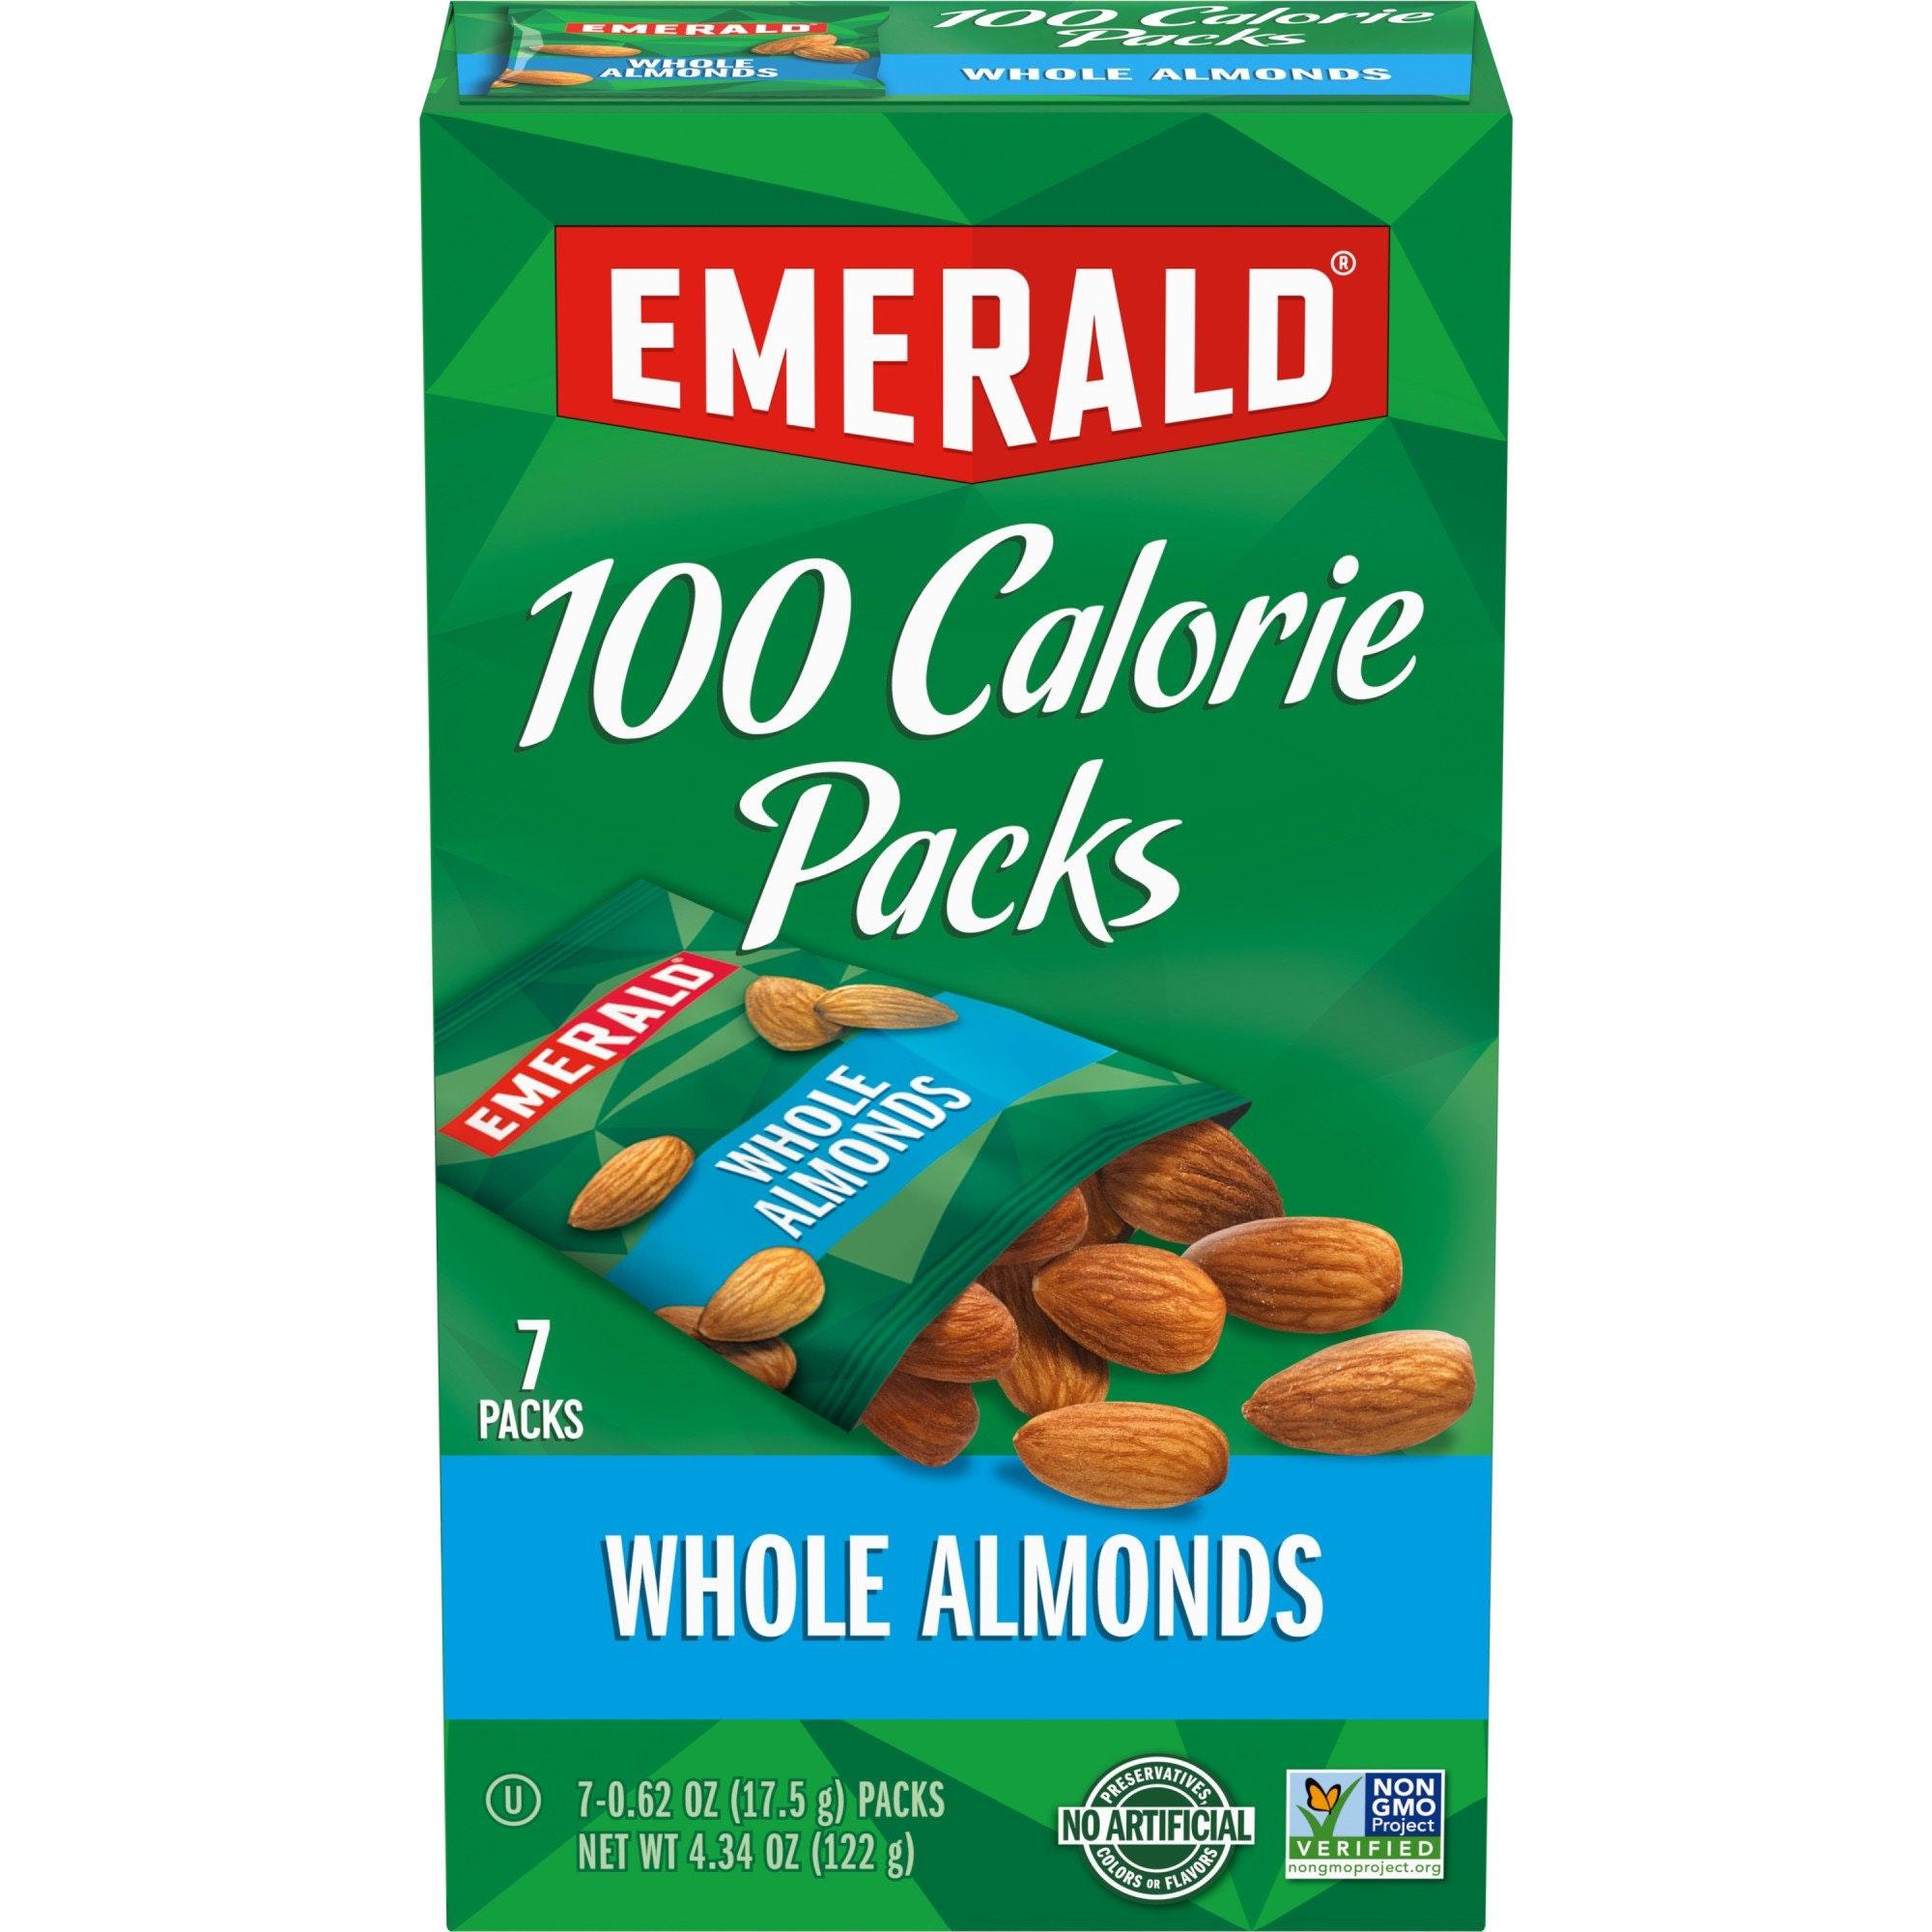 Emerald Whole Almonds 100 Calorie Pack